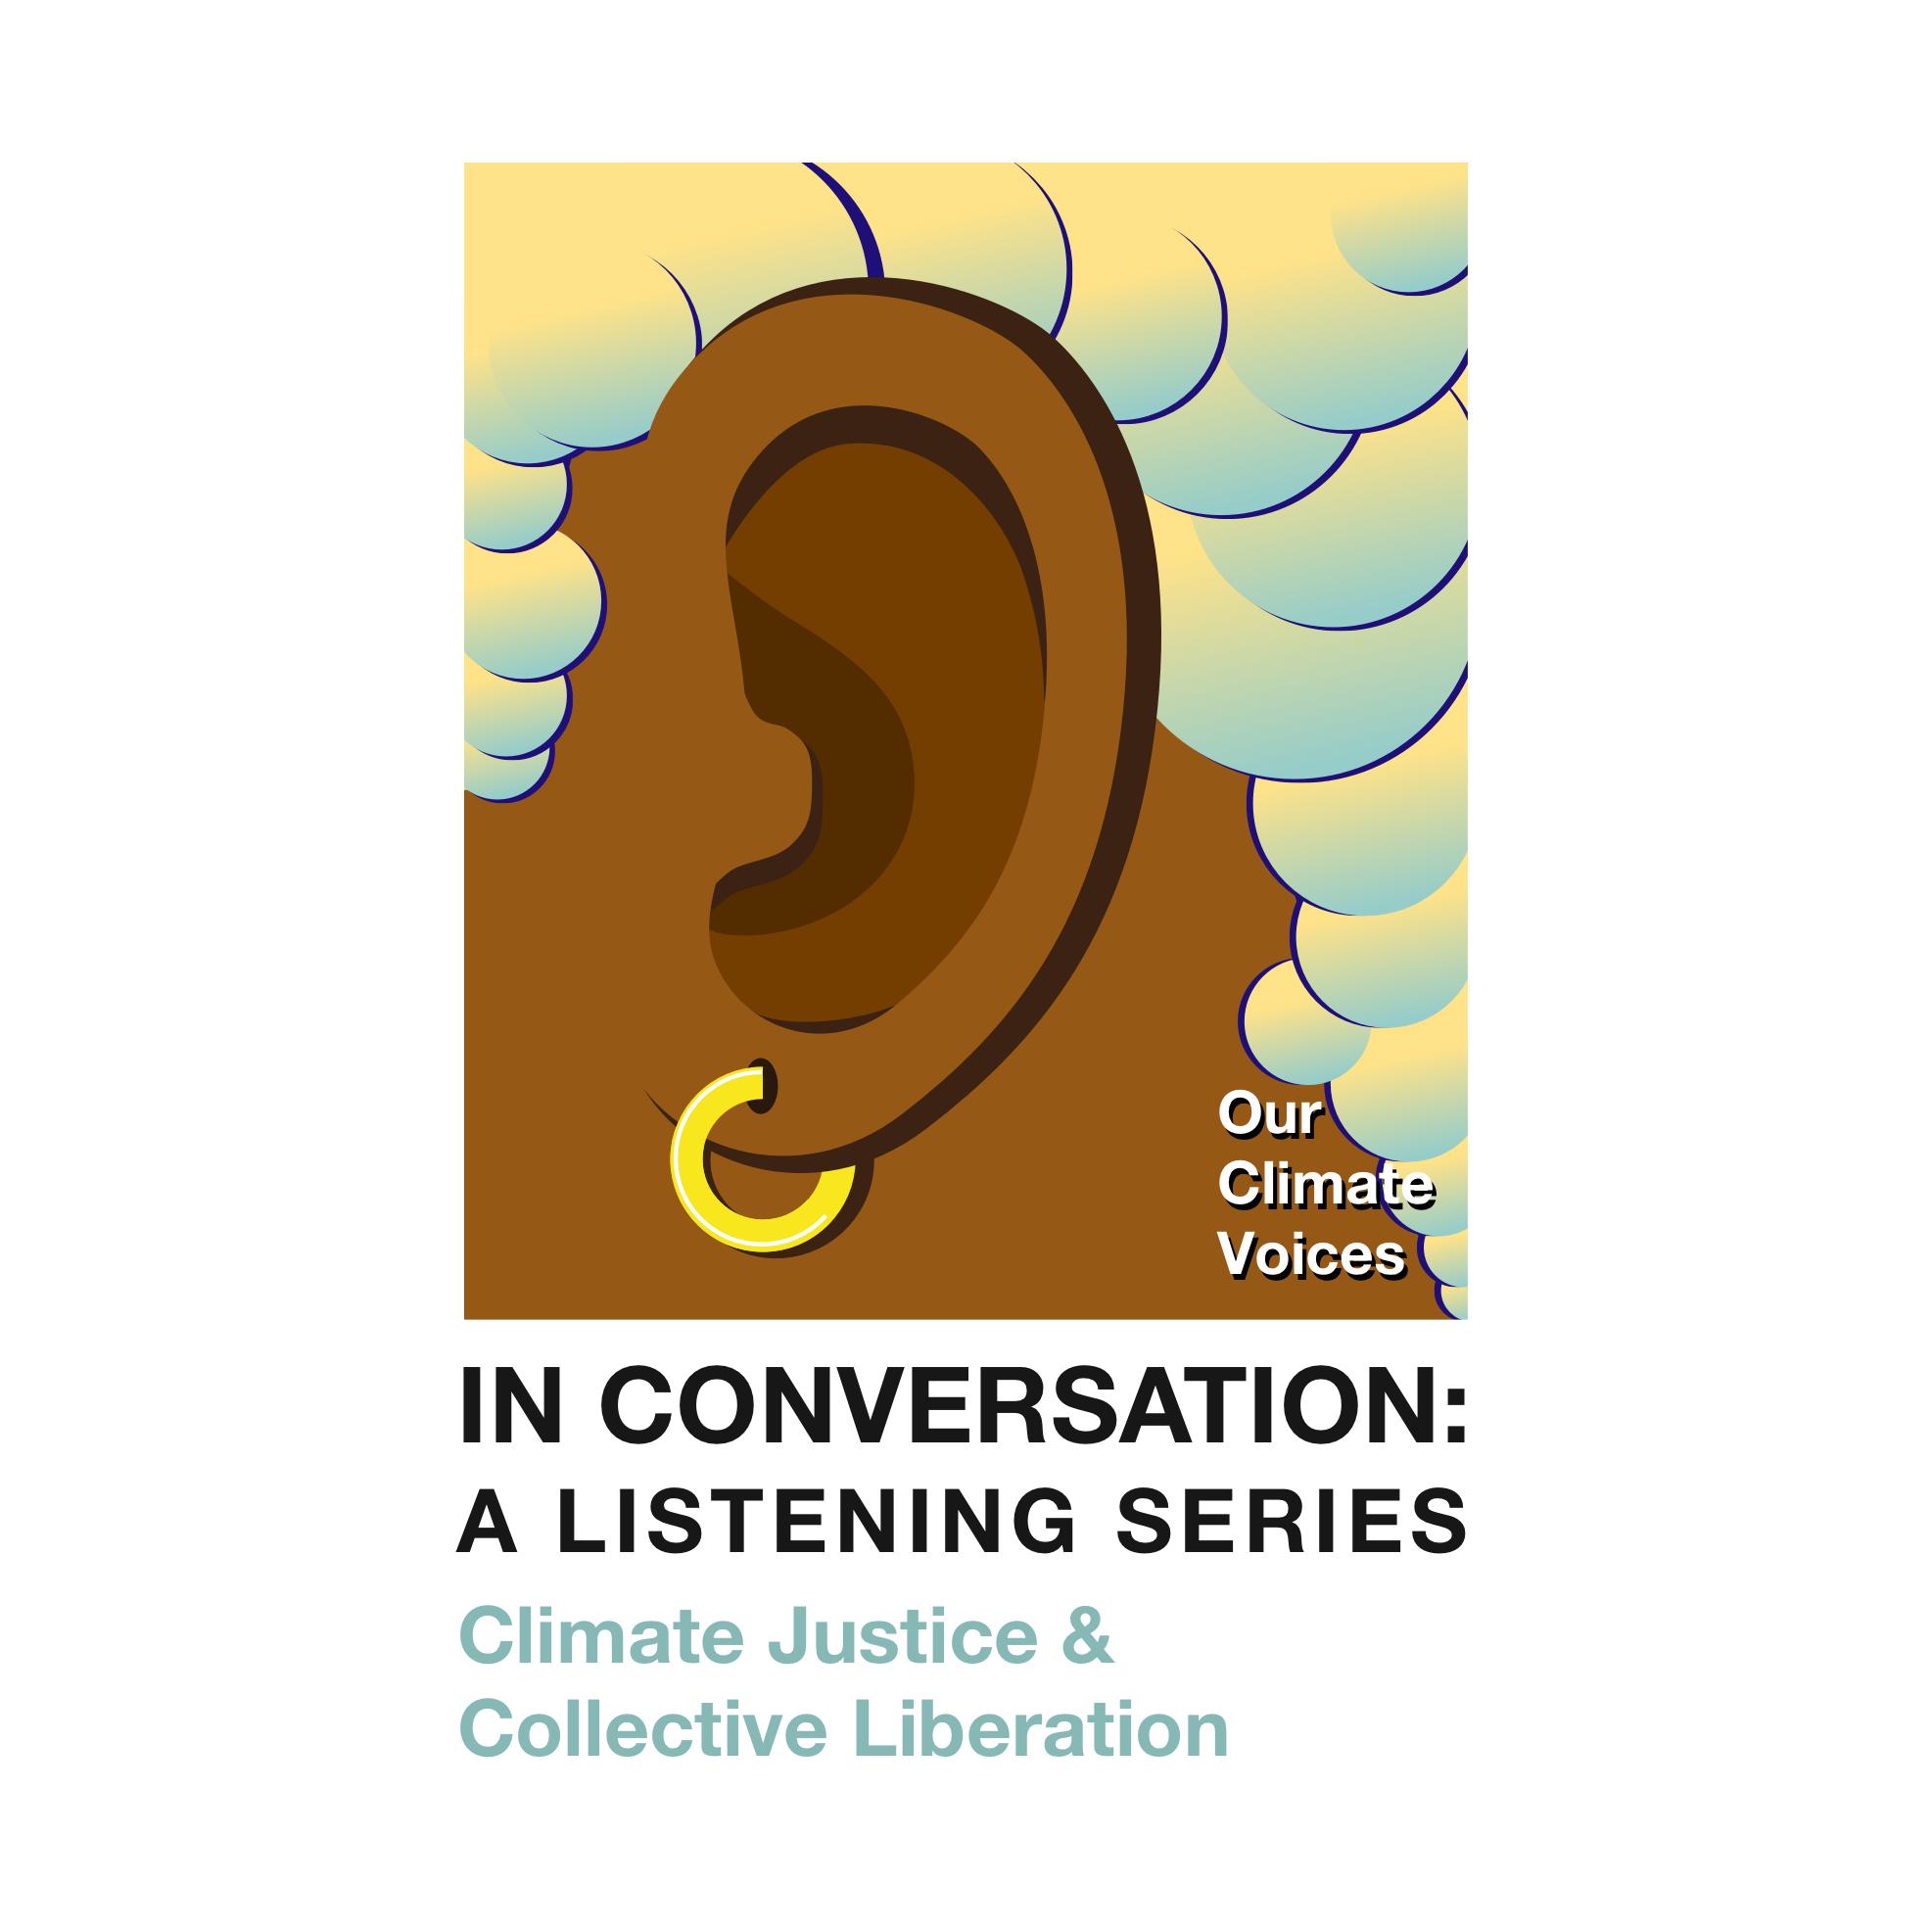 OCS_Listening_Series_1.png